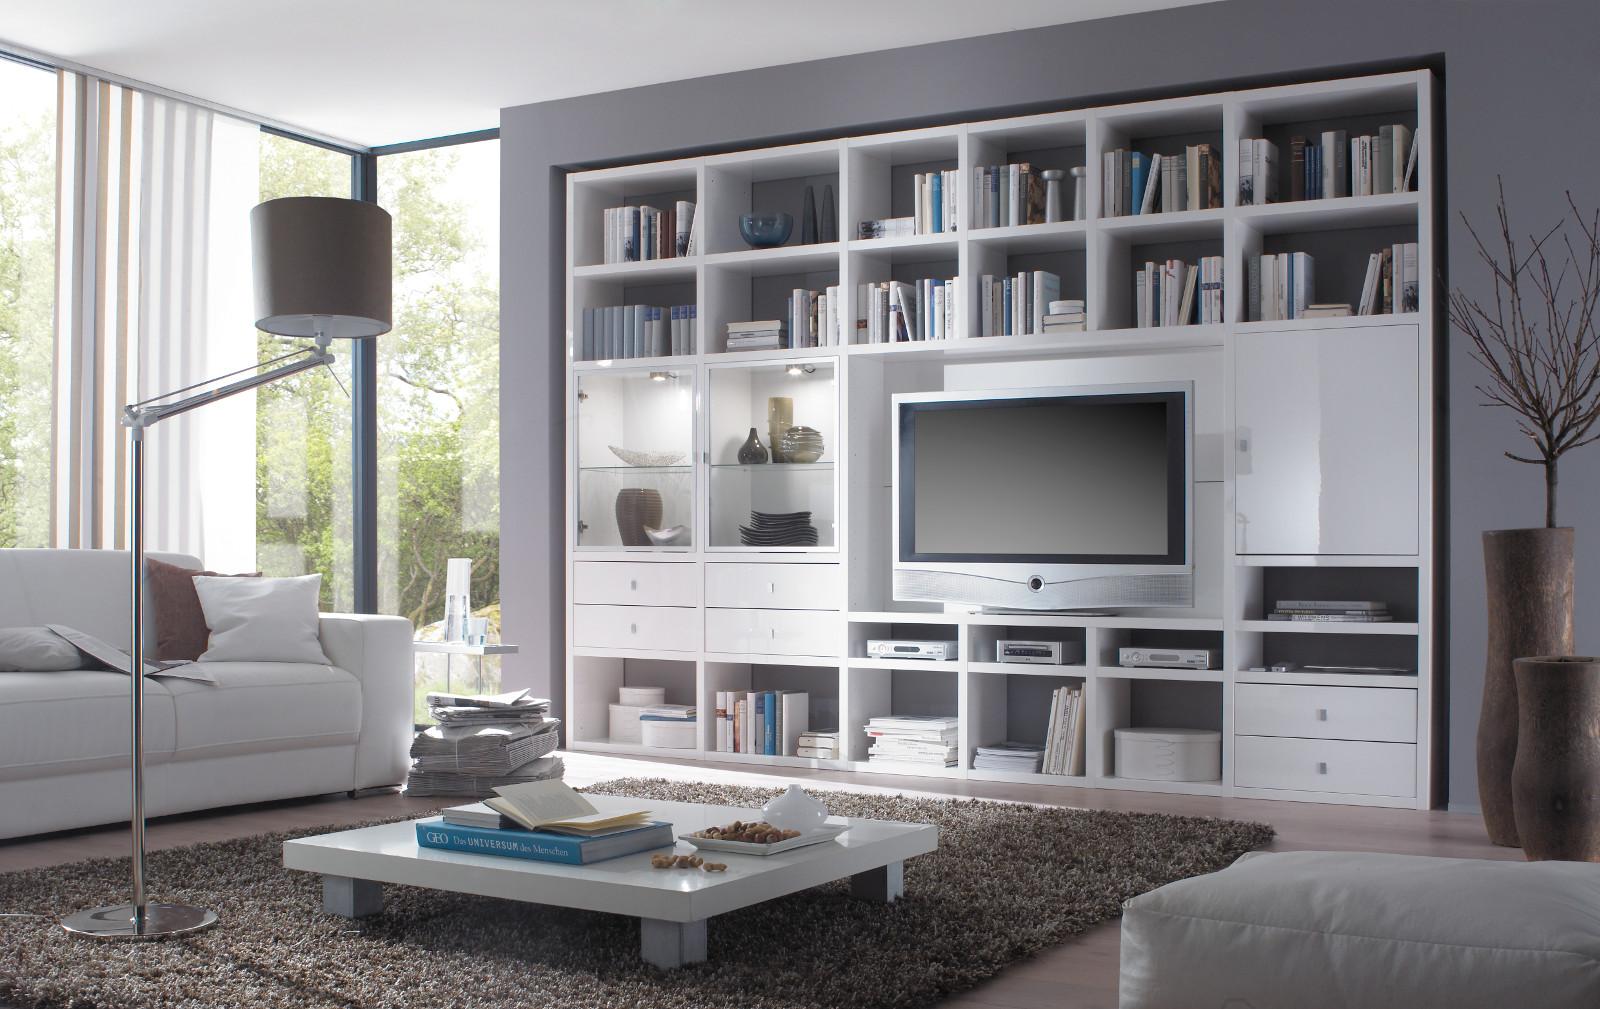 b cherregal b cherwand bibliothek lack wei glanz. Black Bedroom Furniture Sets. Home Design Ideas